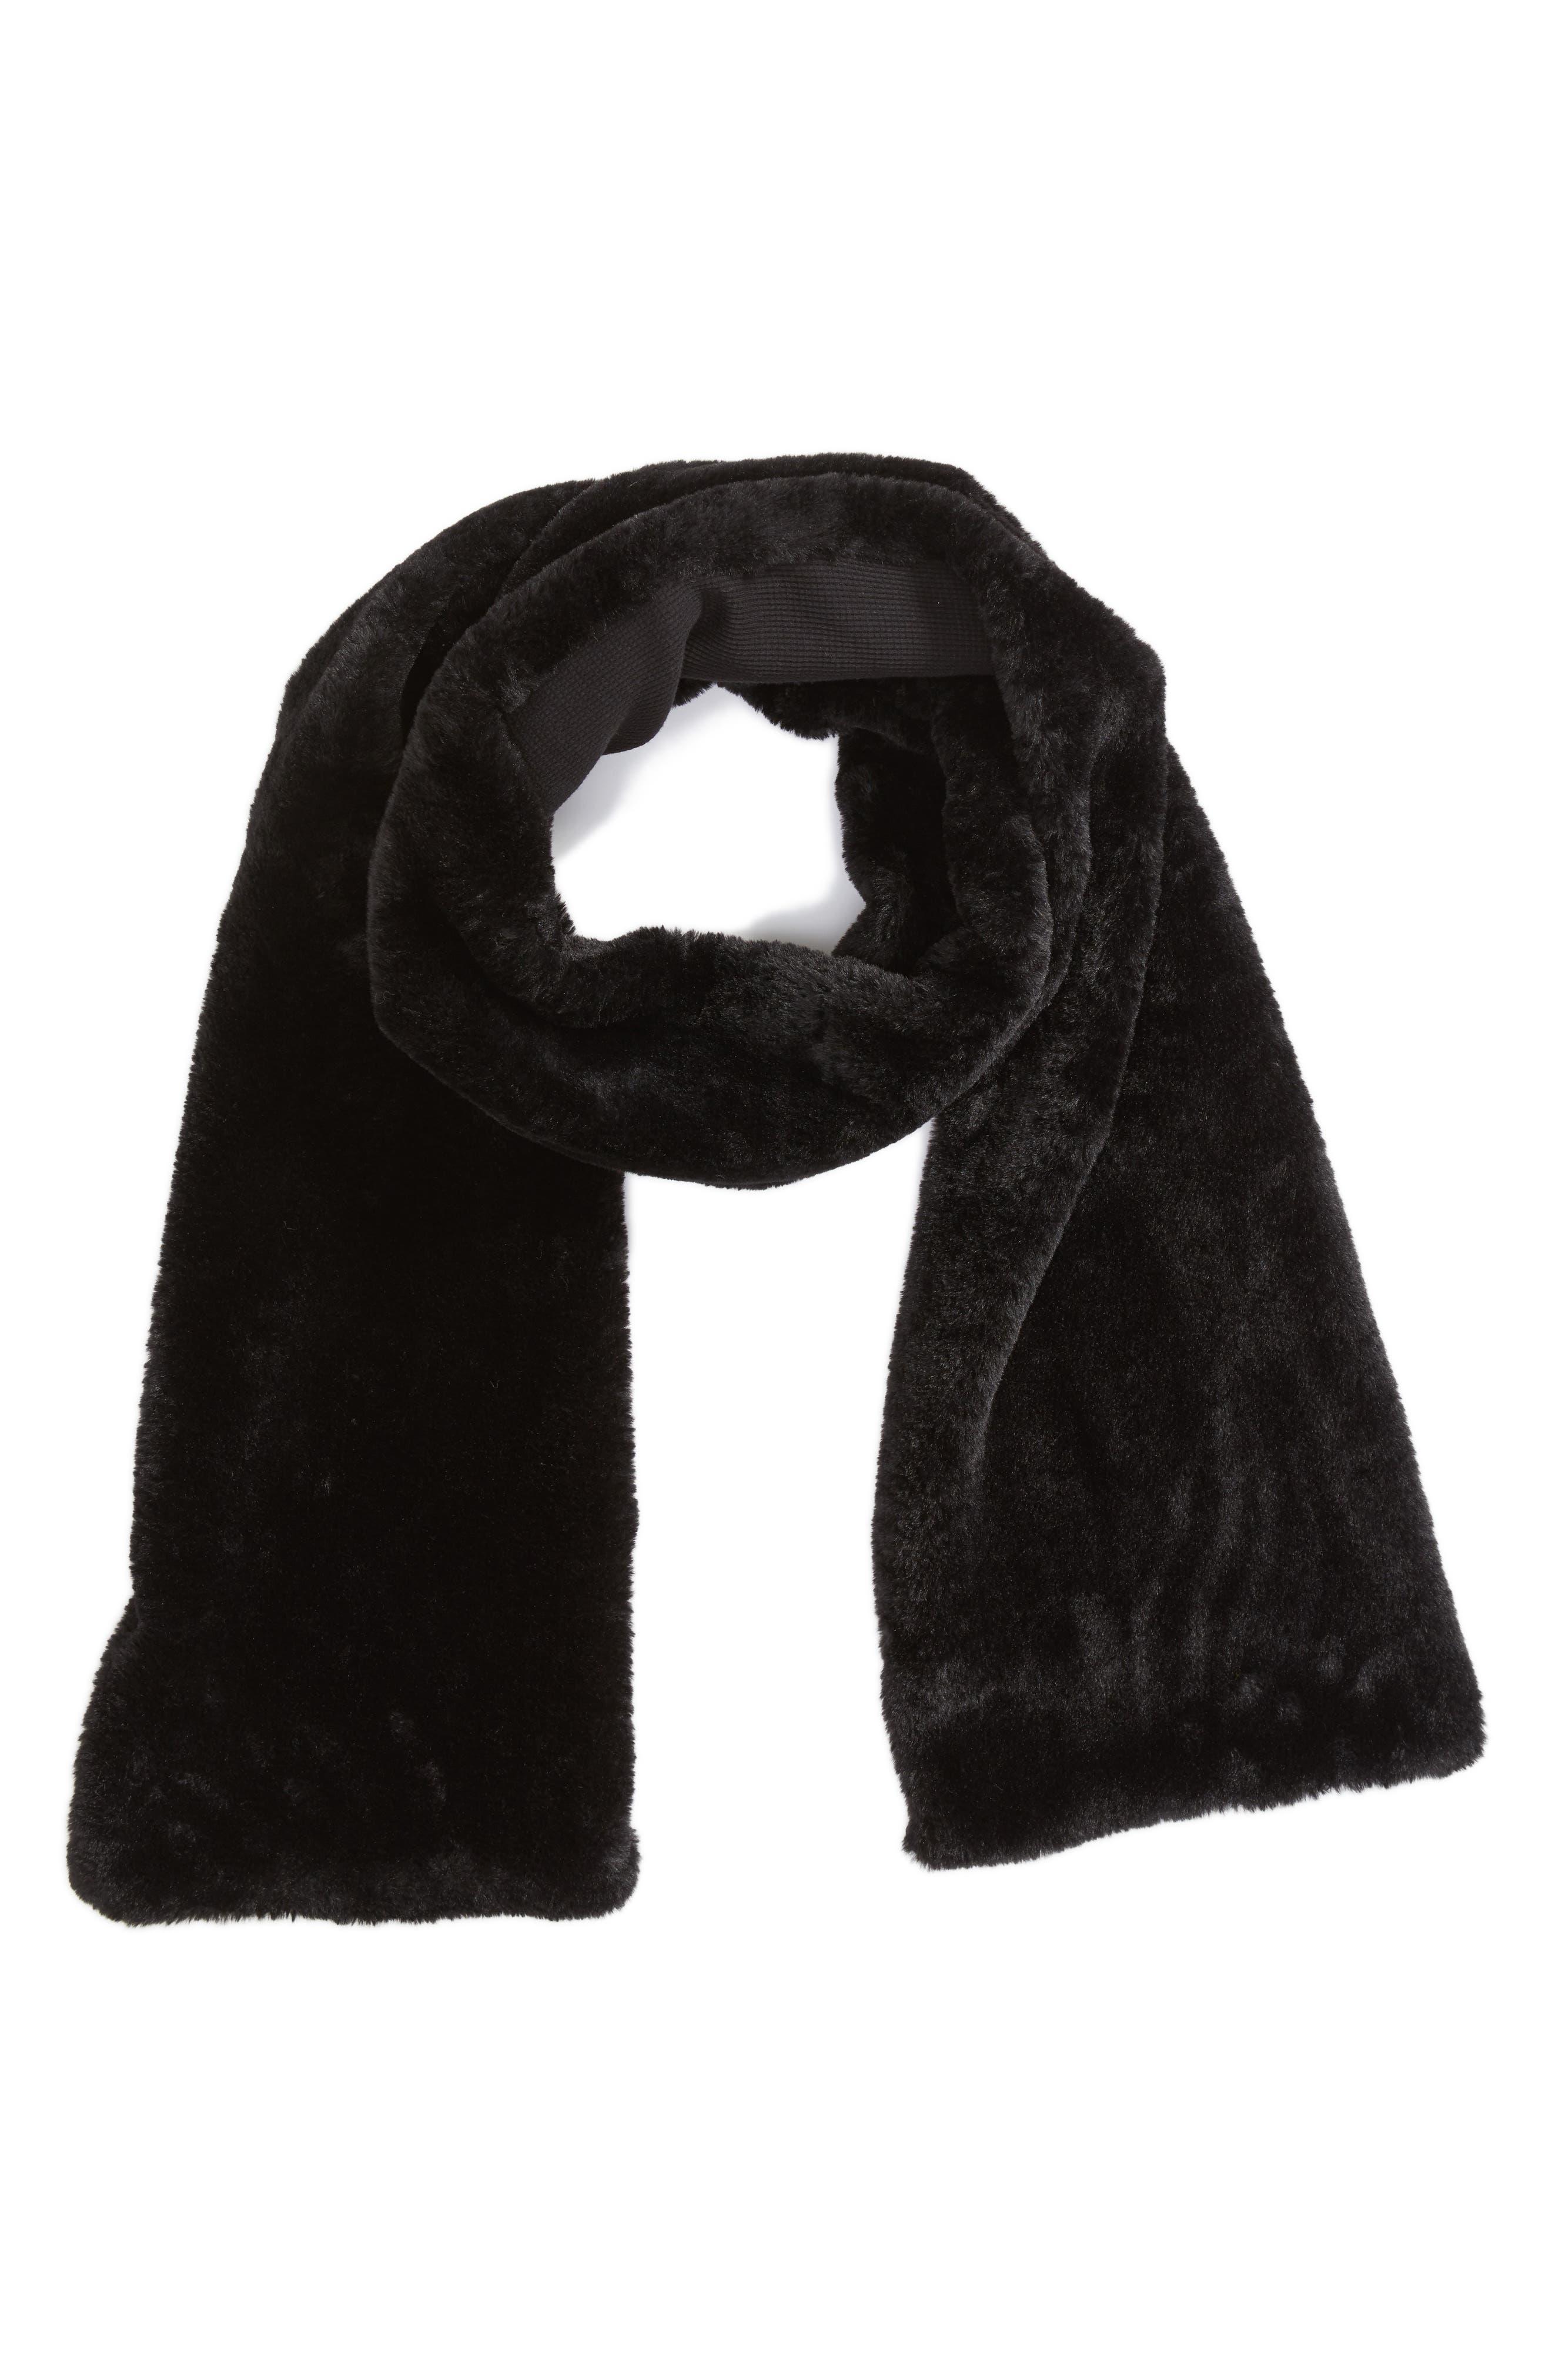 Main Image - Donni Charm Faux Fur Long Scarf